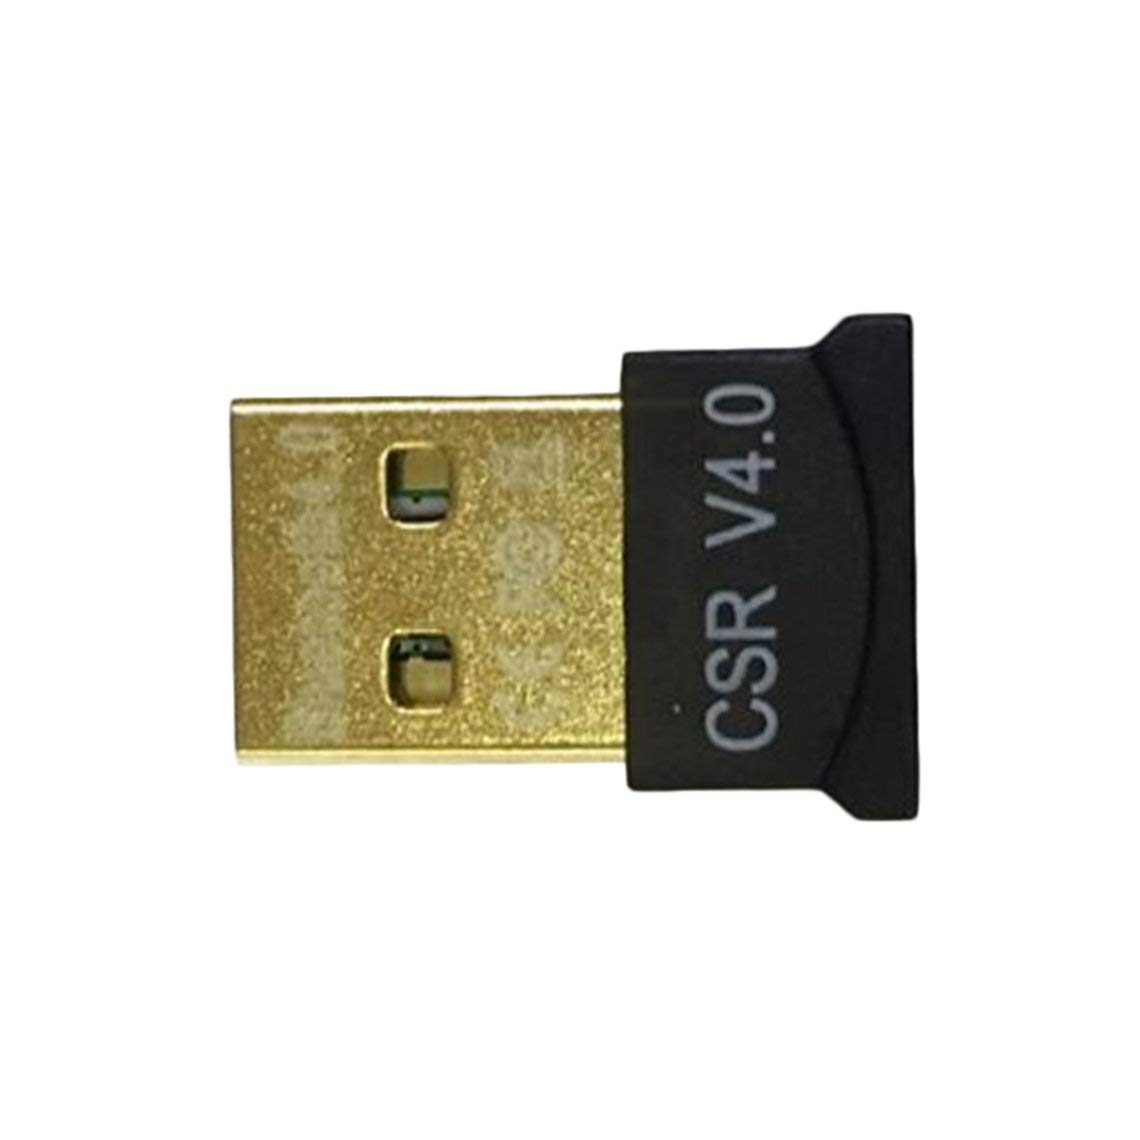 Zinniaya Mini USB Adapter CSR Dual Mode Wireless V4.0 EDR Dongle USB Transmitter For Windows 7 8 10 PC Laptop